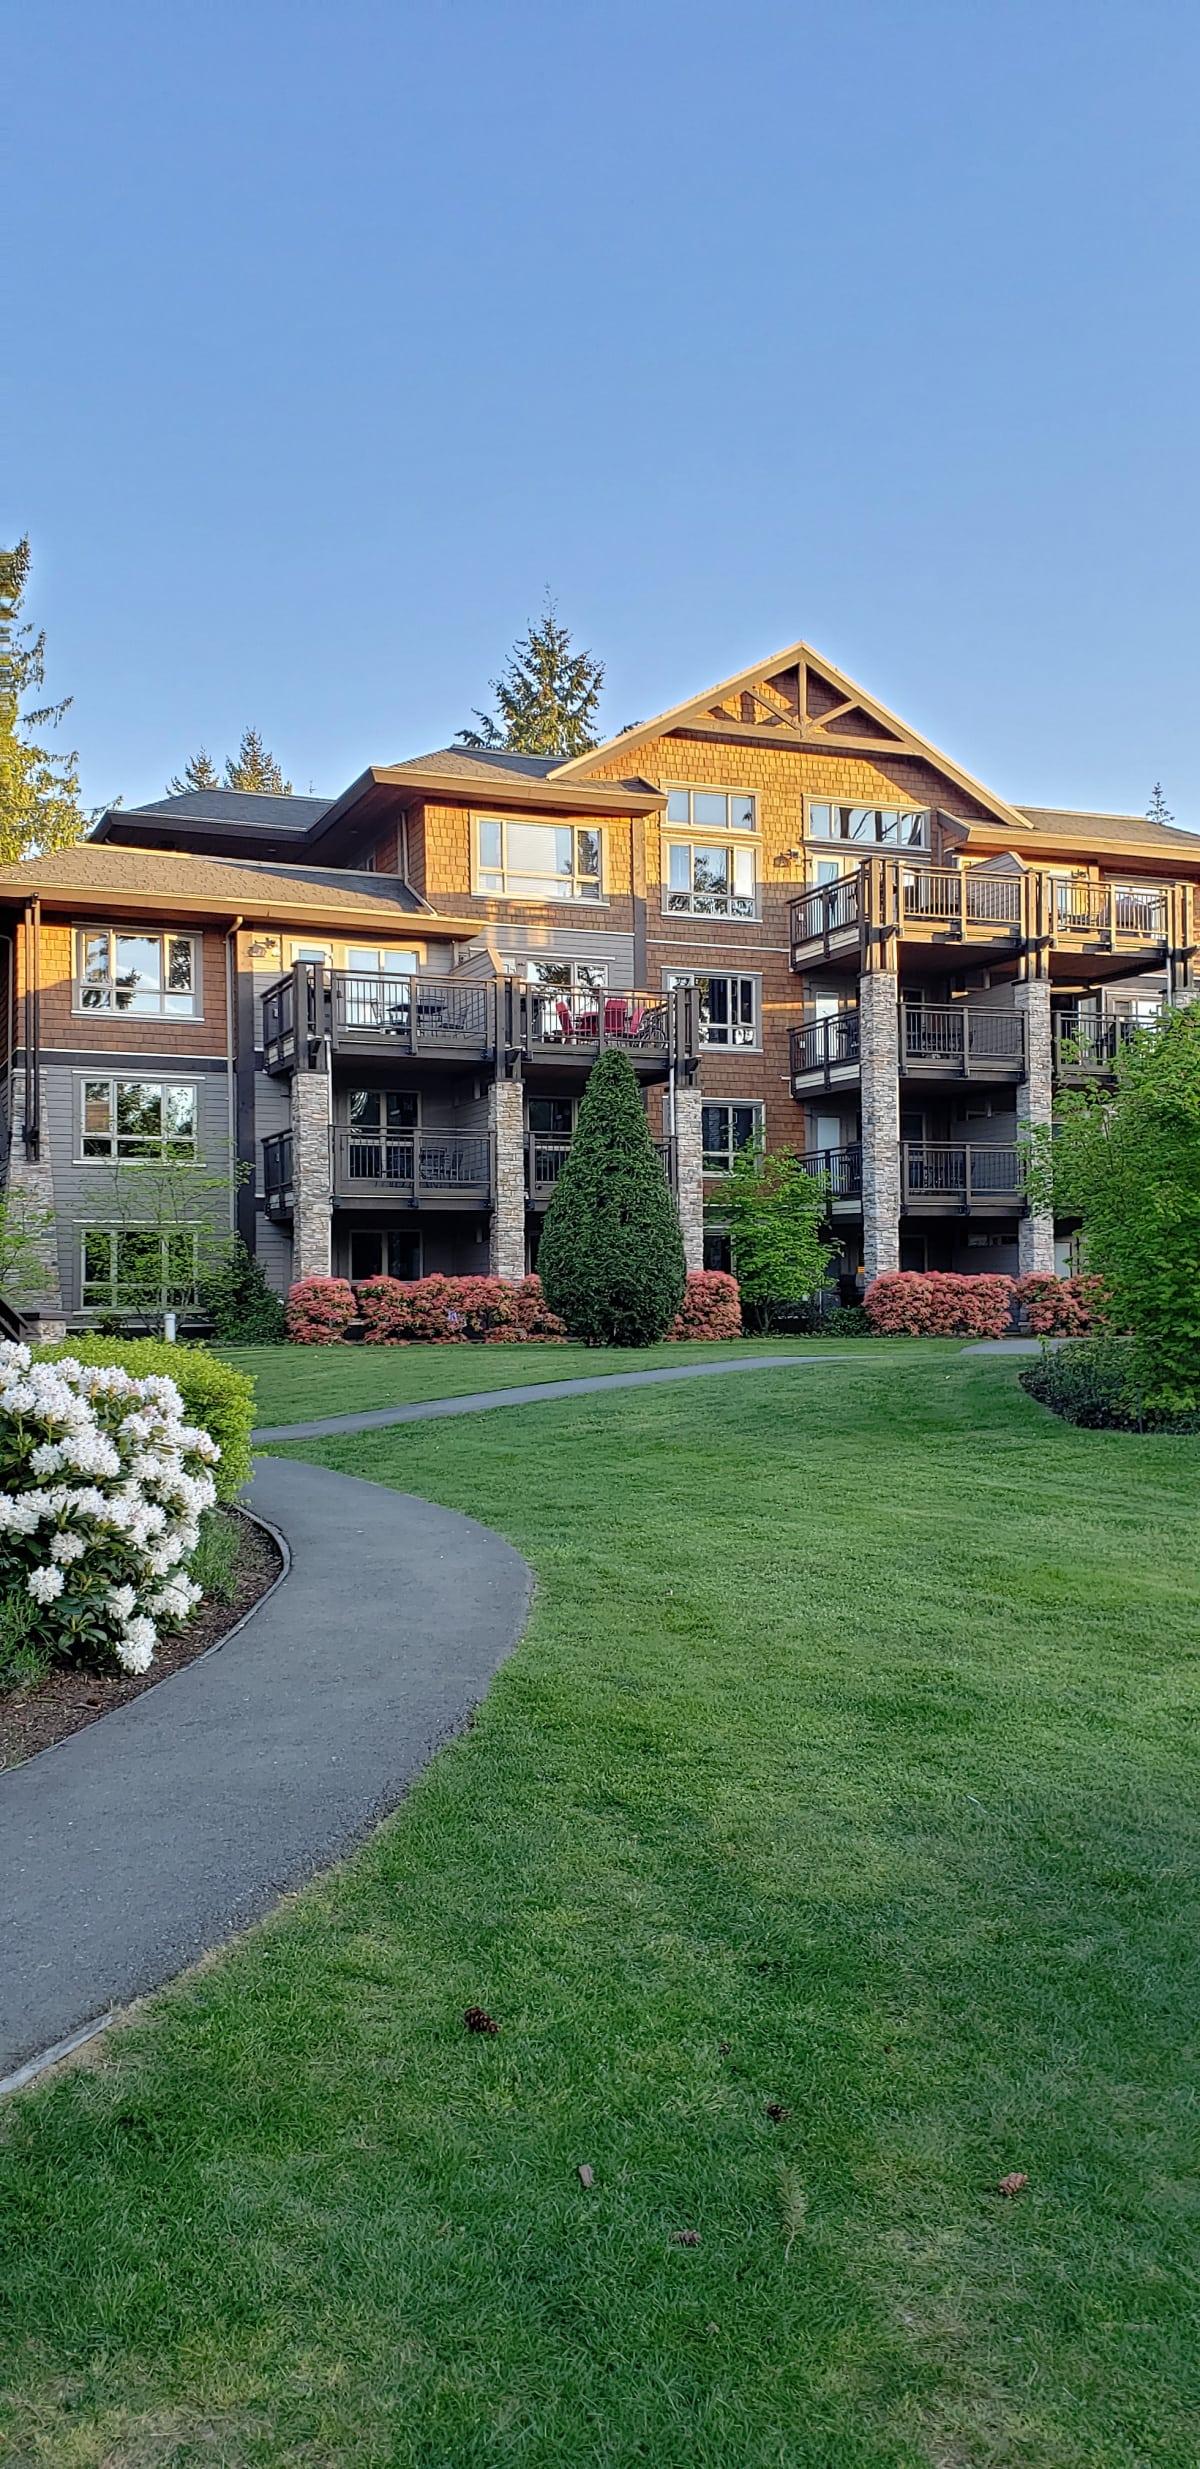 Sunrise Ridge Resort Parksville British Columbia girls getaway